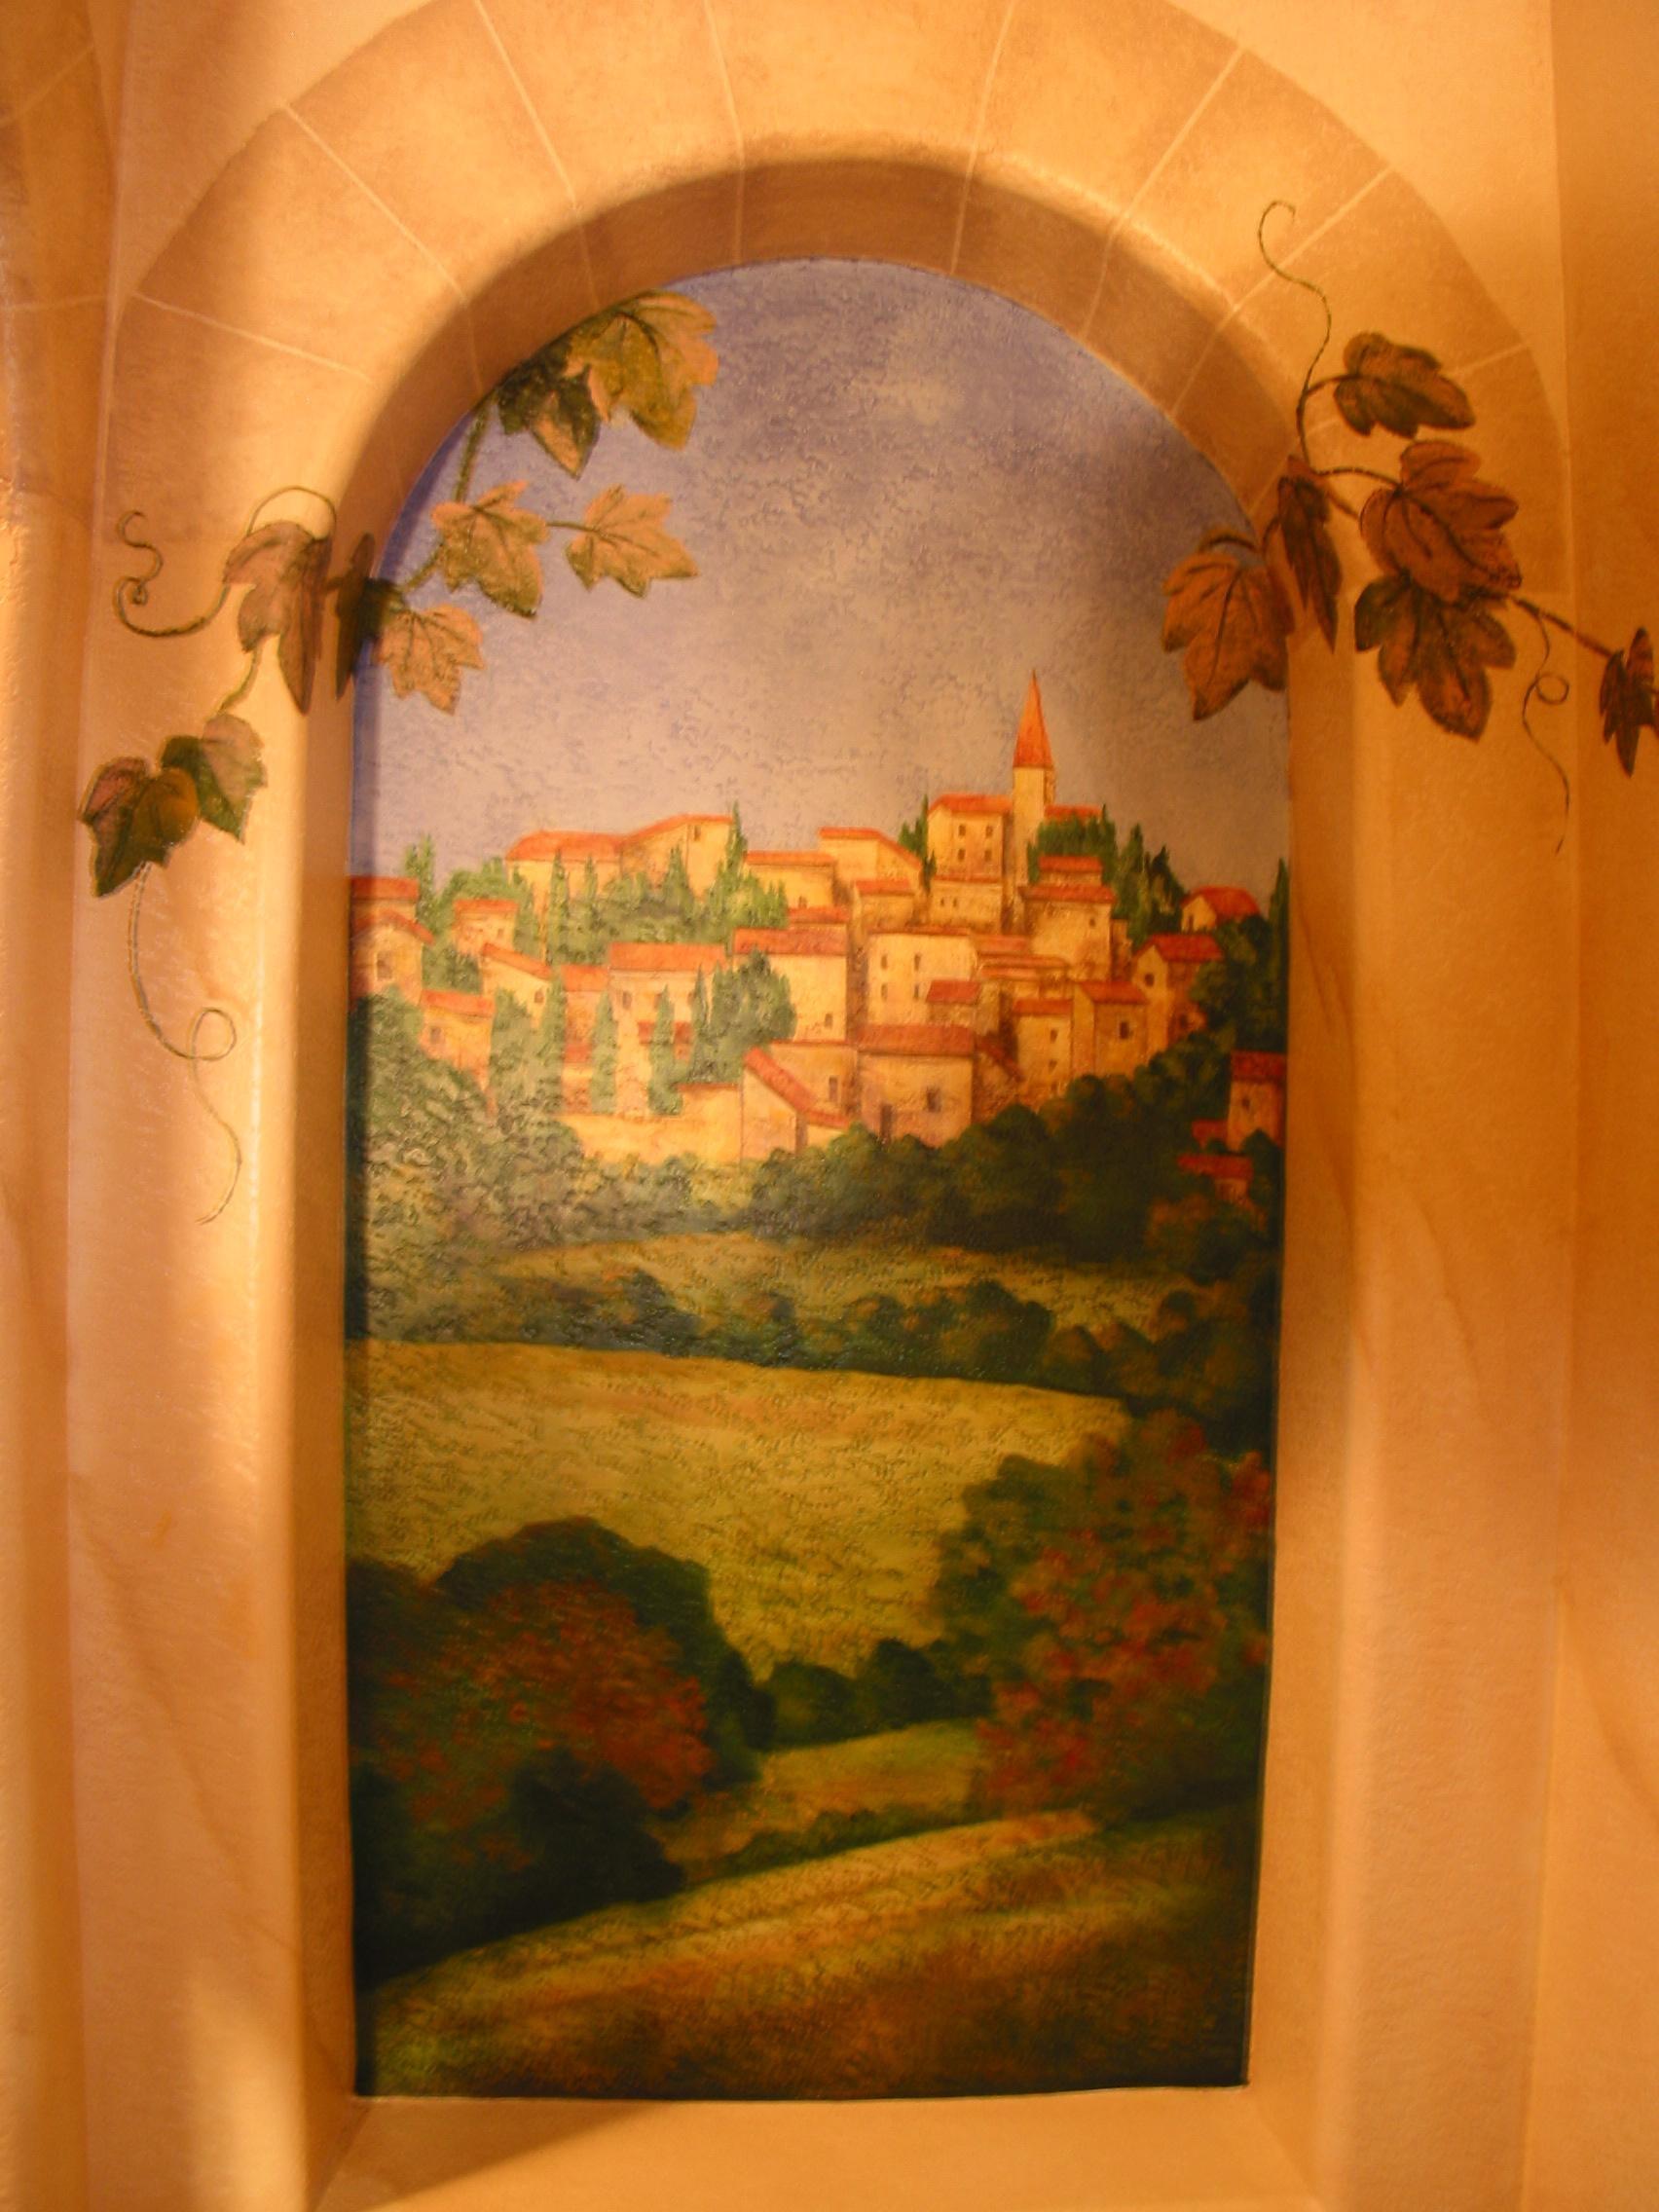 Trompe L'œil Mural ~ Italian Renaissance Style | Ruthie Lowen Within Italian Renaissance Wall Art (Image 19 of 20)